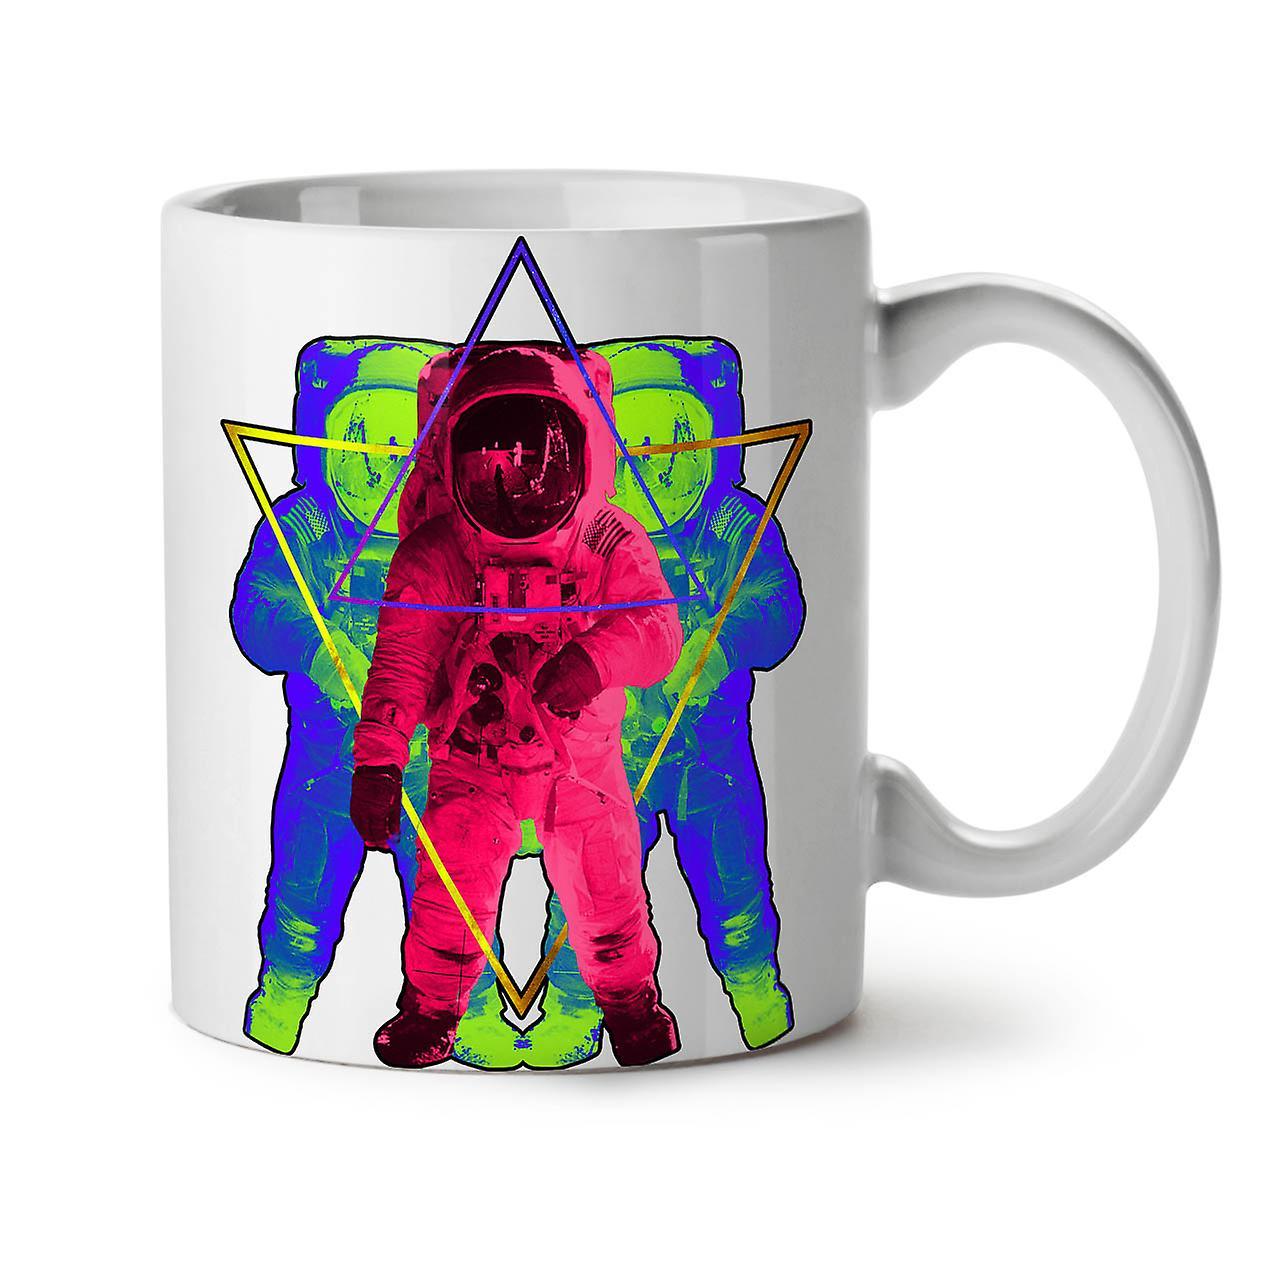 Astronaut 11 New Psychedelic Coffee OzWellcoda Ceramic Tea White Mug mv8OywNn0P